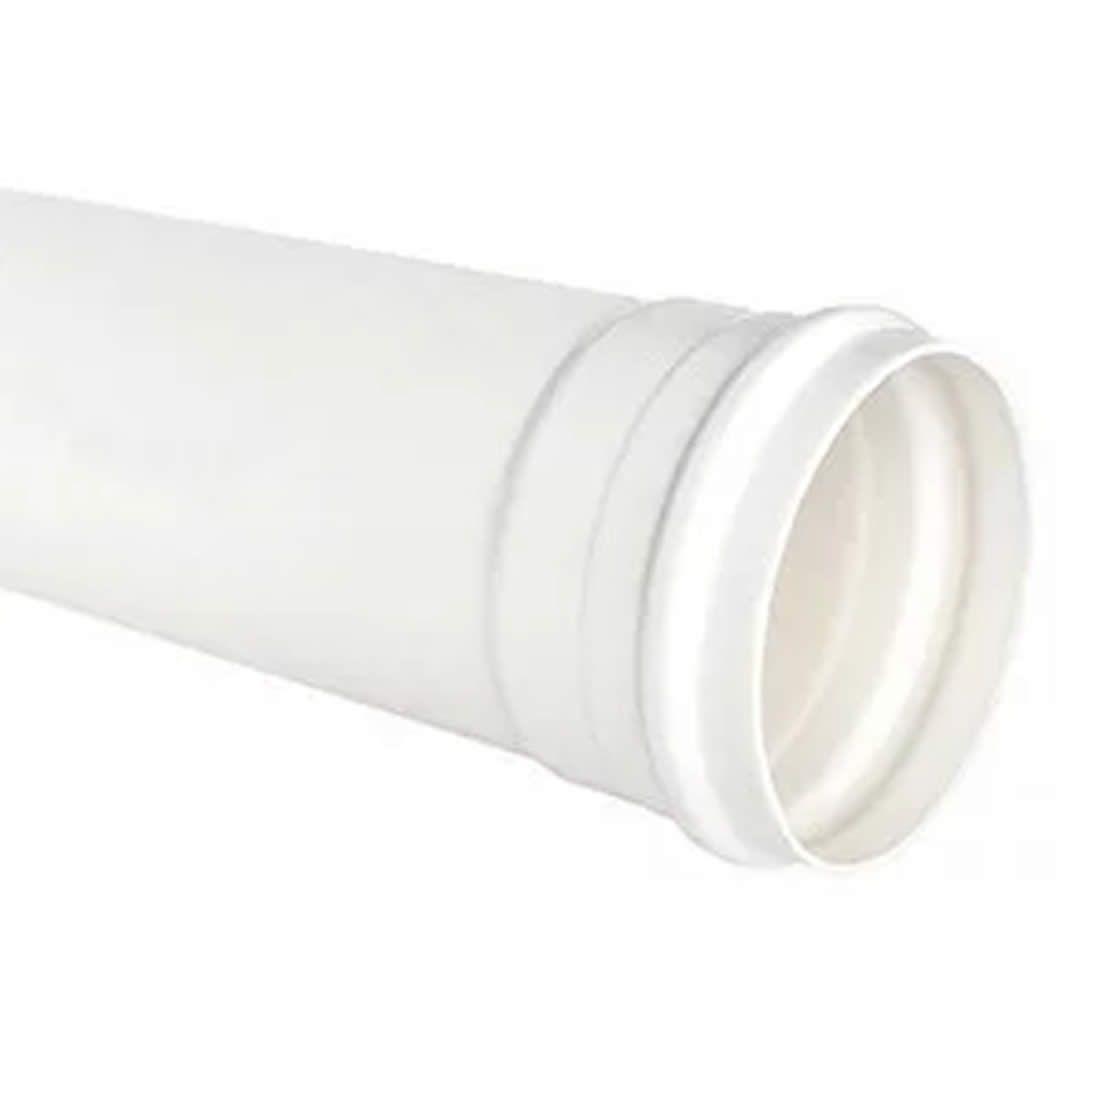 Tubo PVC Para Esgoto 40mm X 6 Metros Tigre